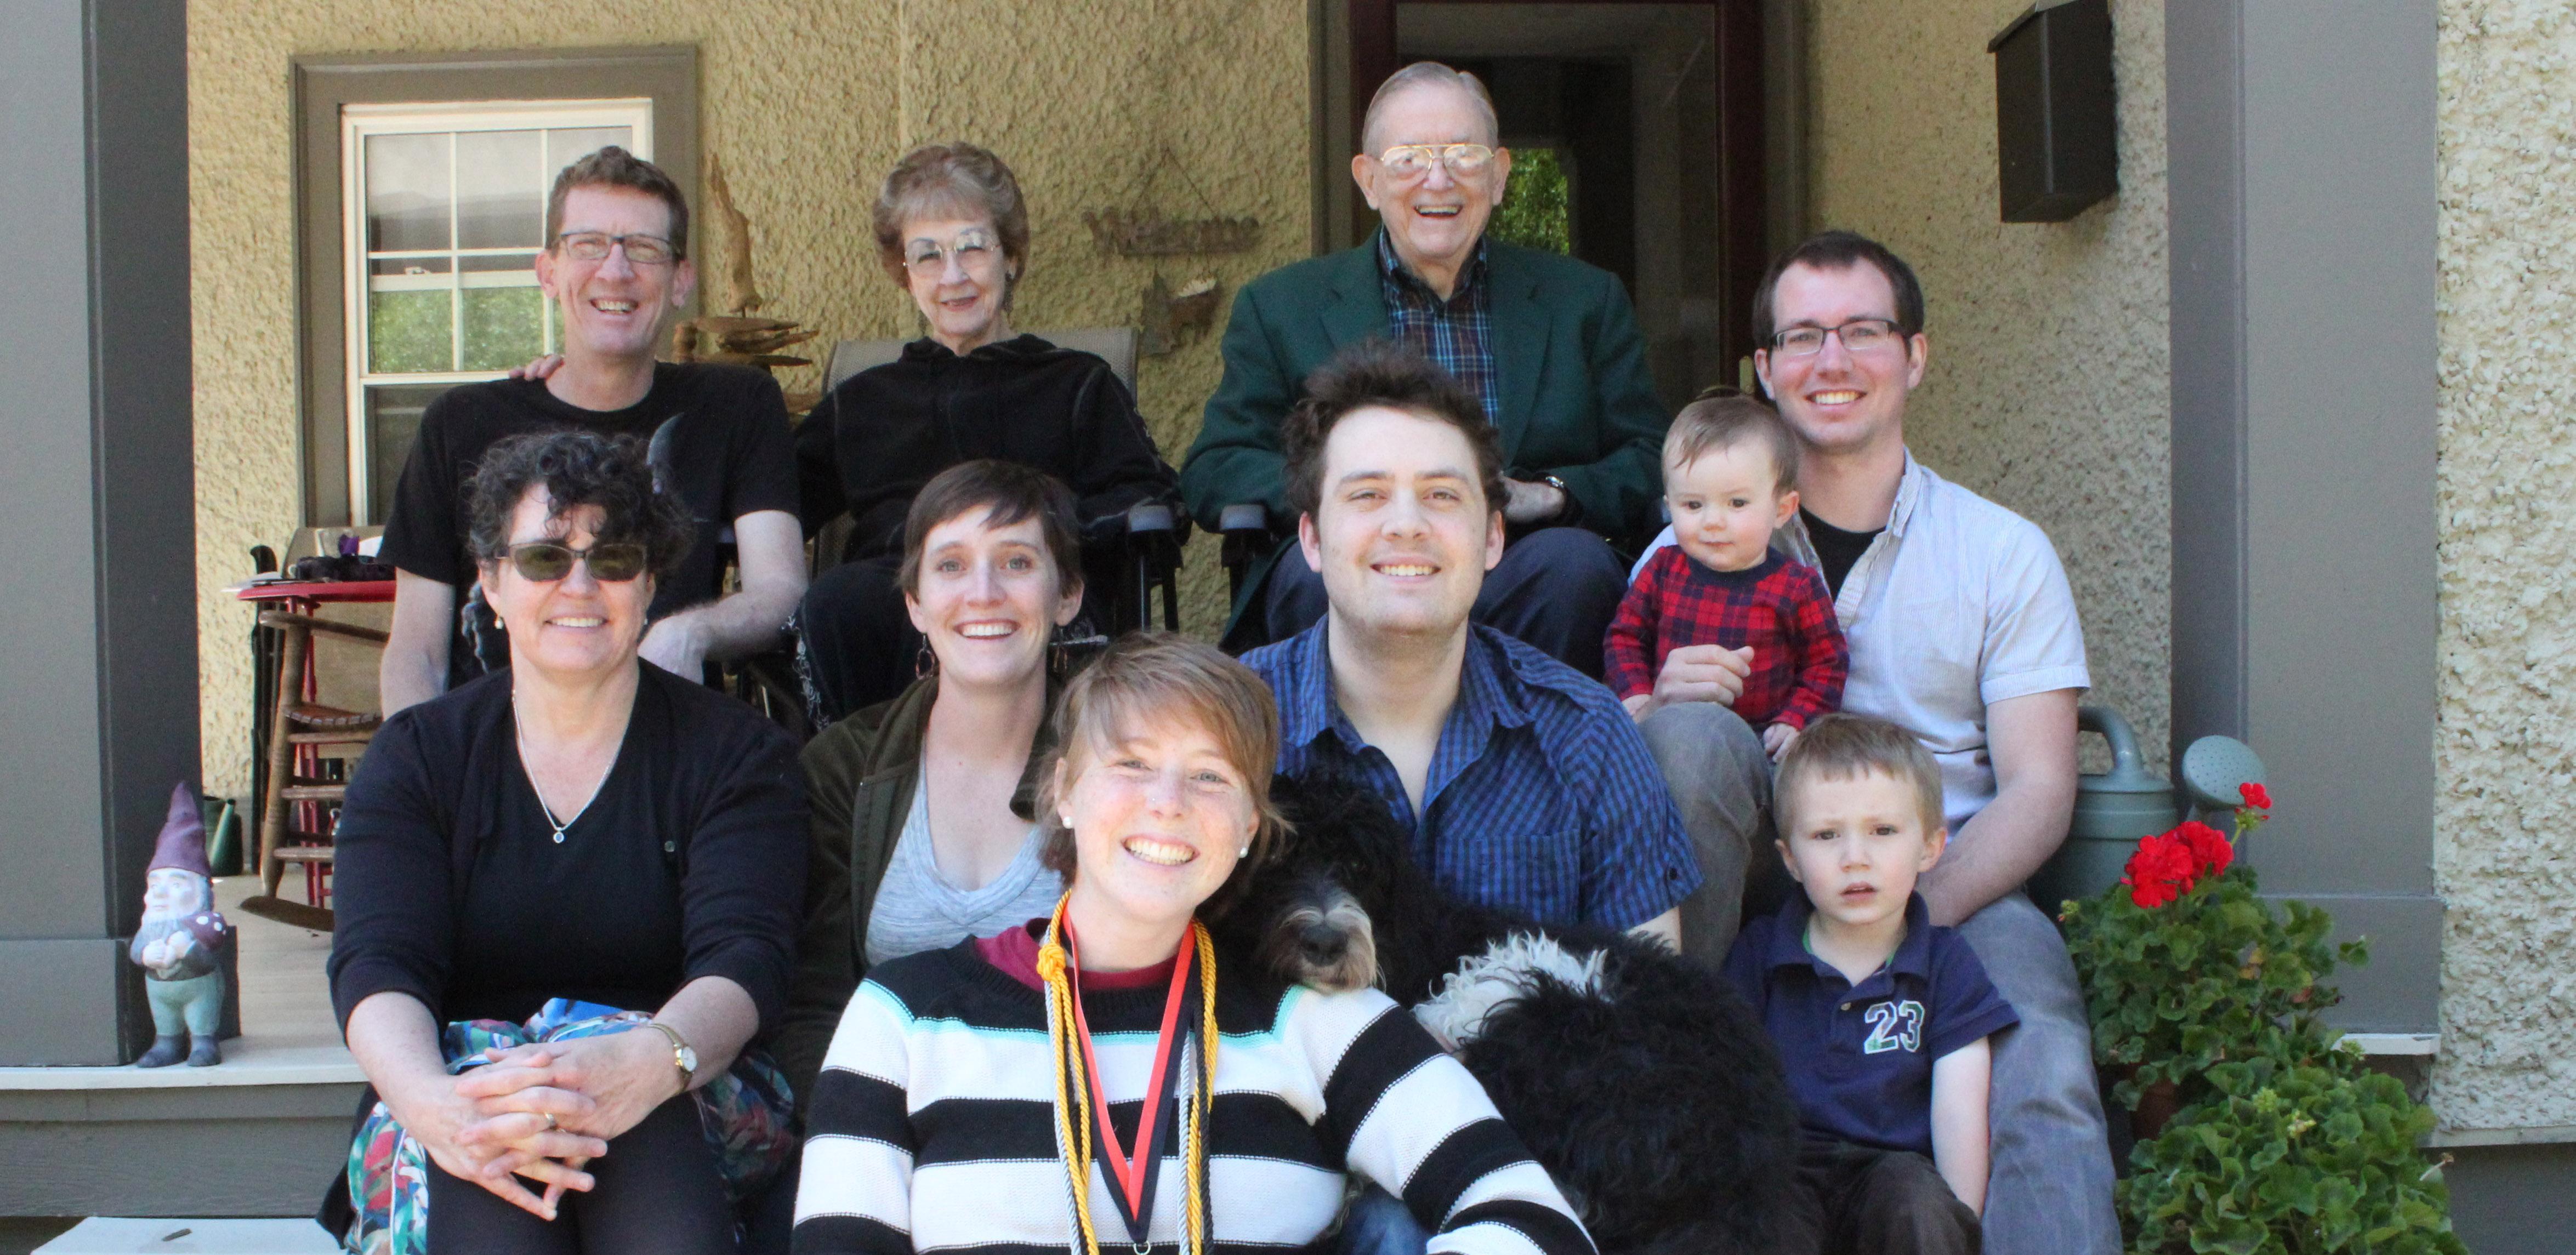 Jim Biard and family